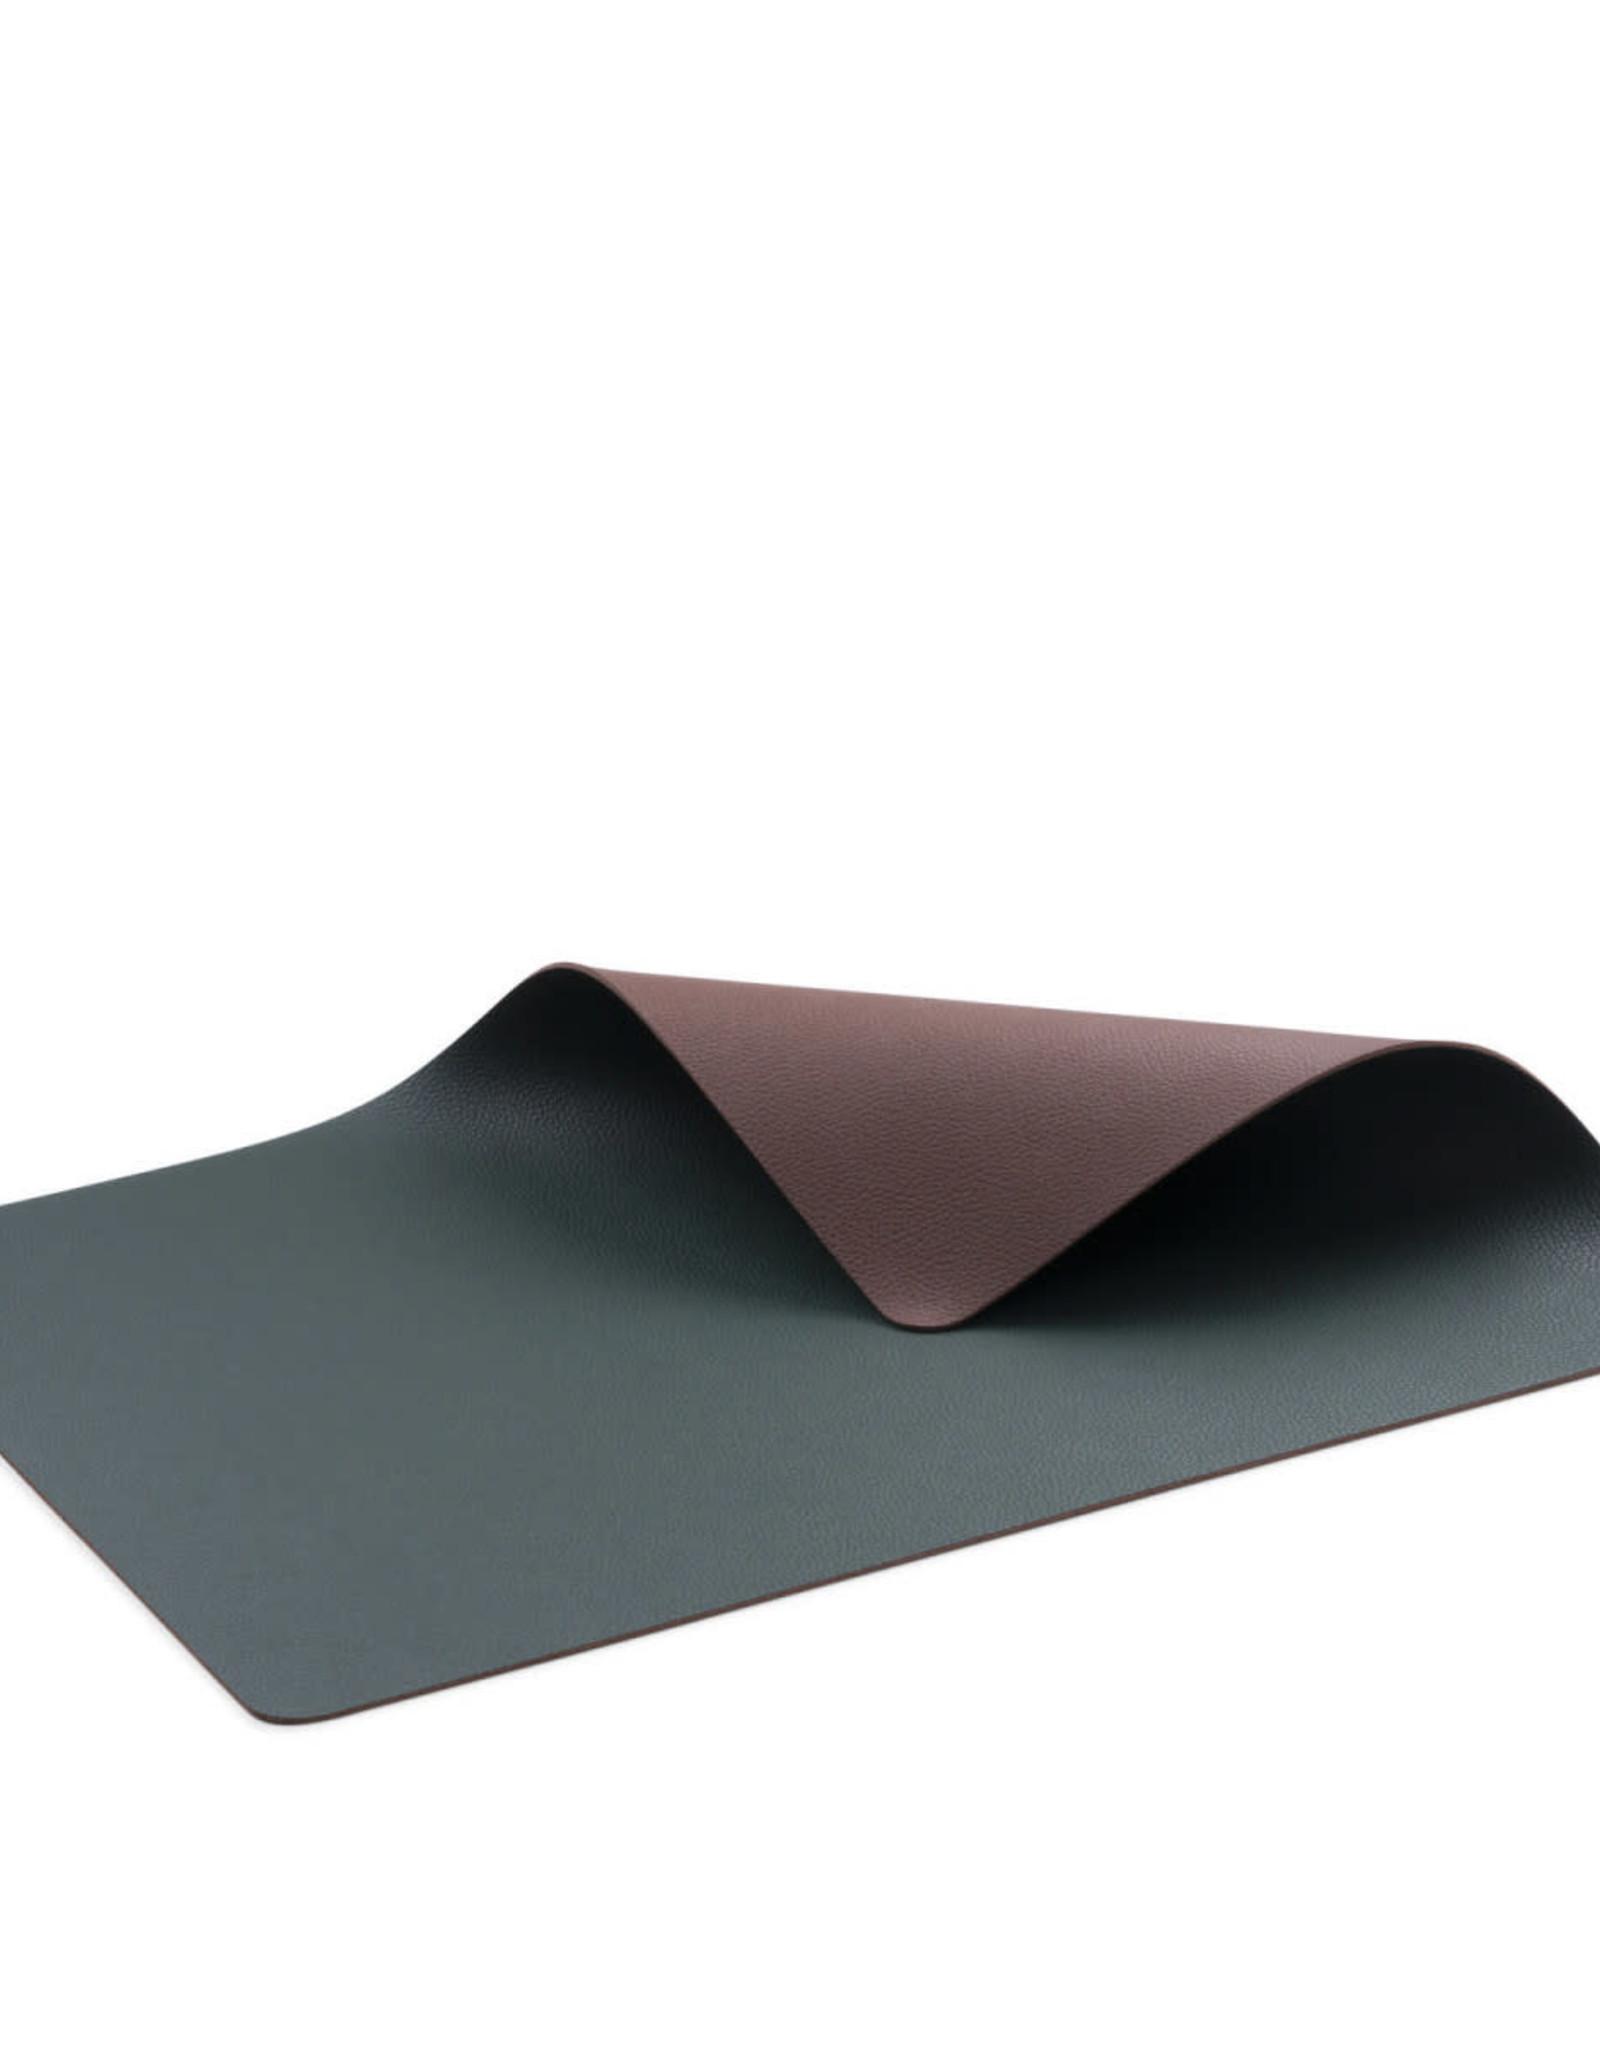 Placemat Leatherlook 33x46cm (set van 4)